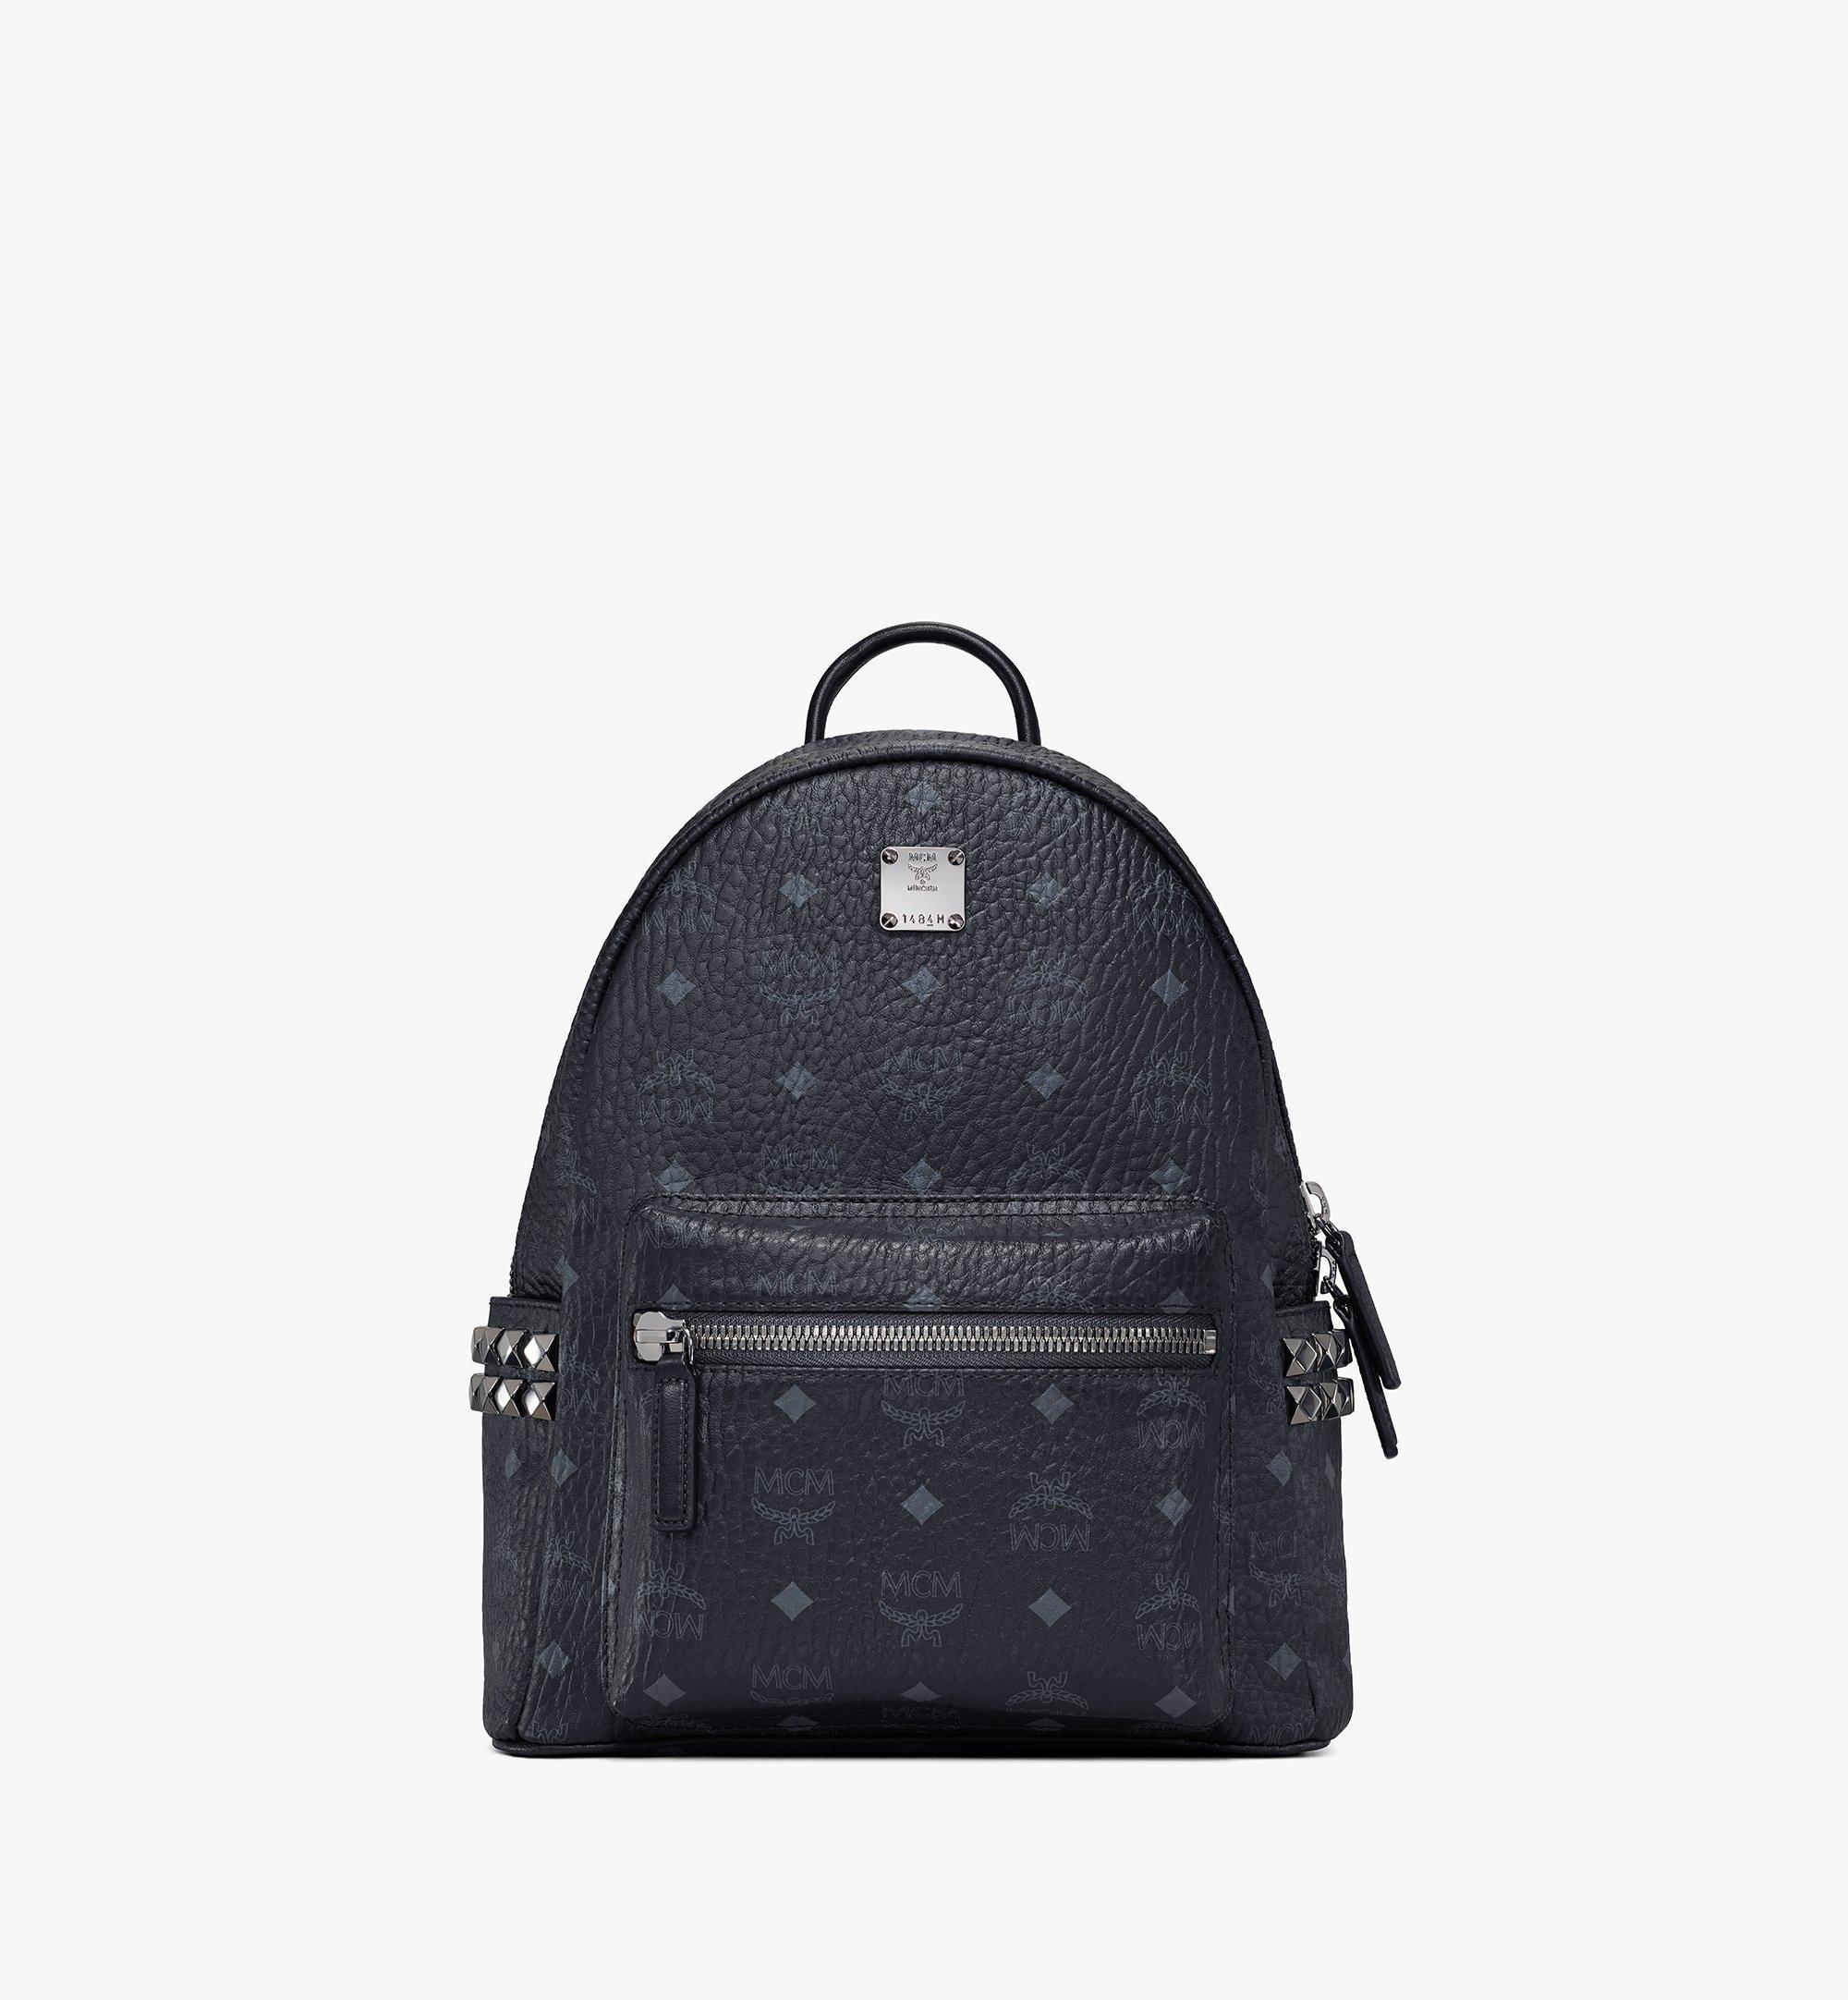 MCM Stark Side Studs Backpack in Visetos Black MMK6SVE37BK001 Alternate View 1